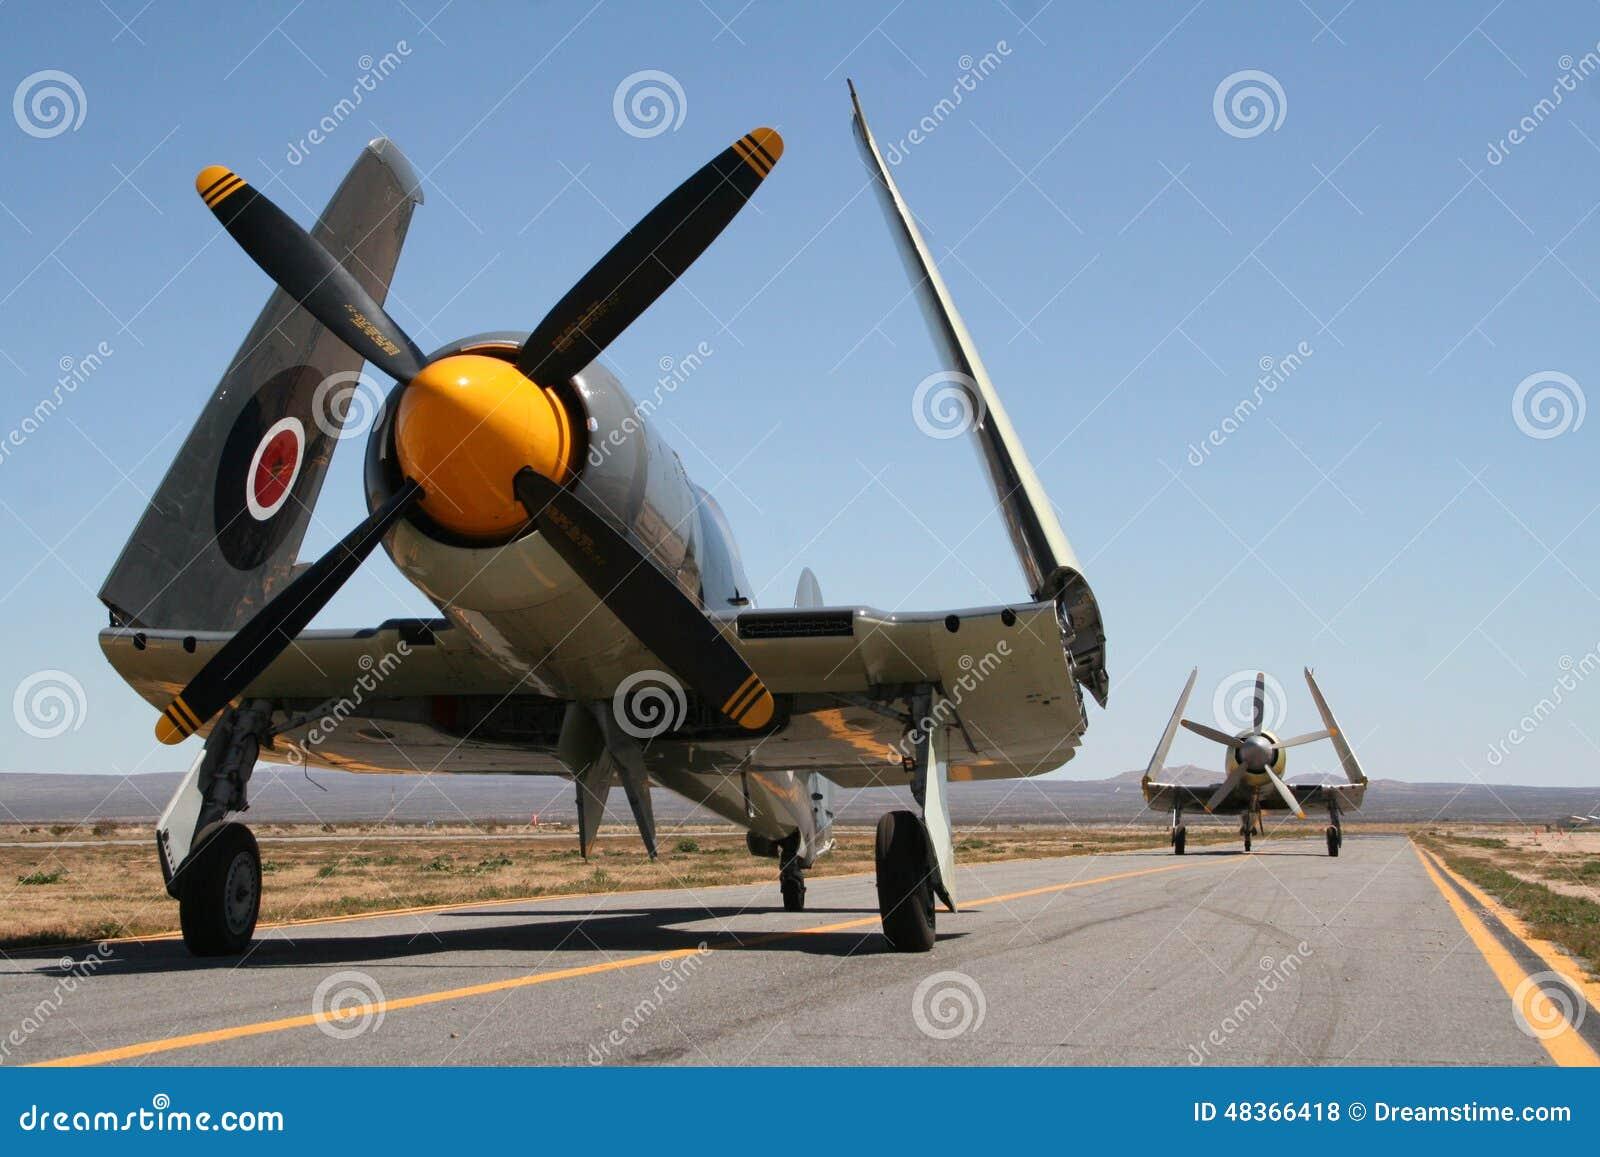 Vintage war planes